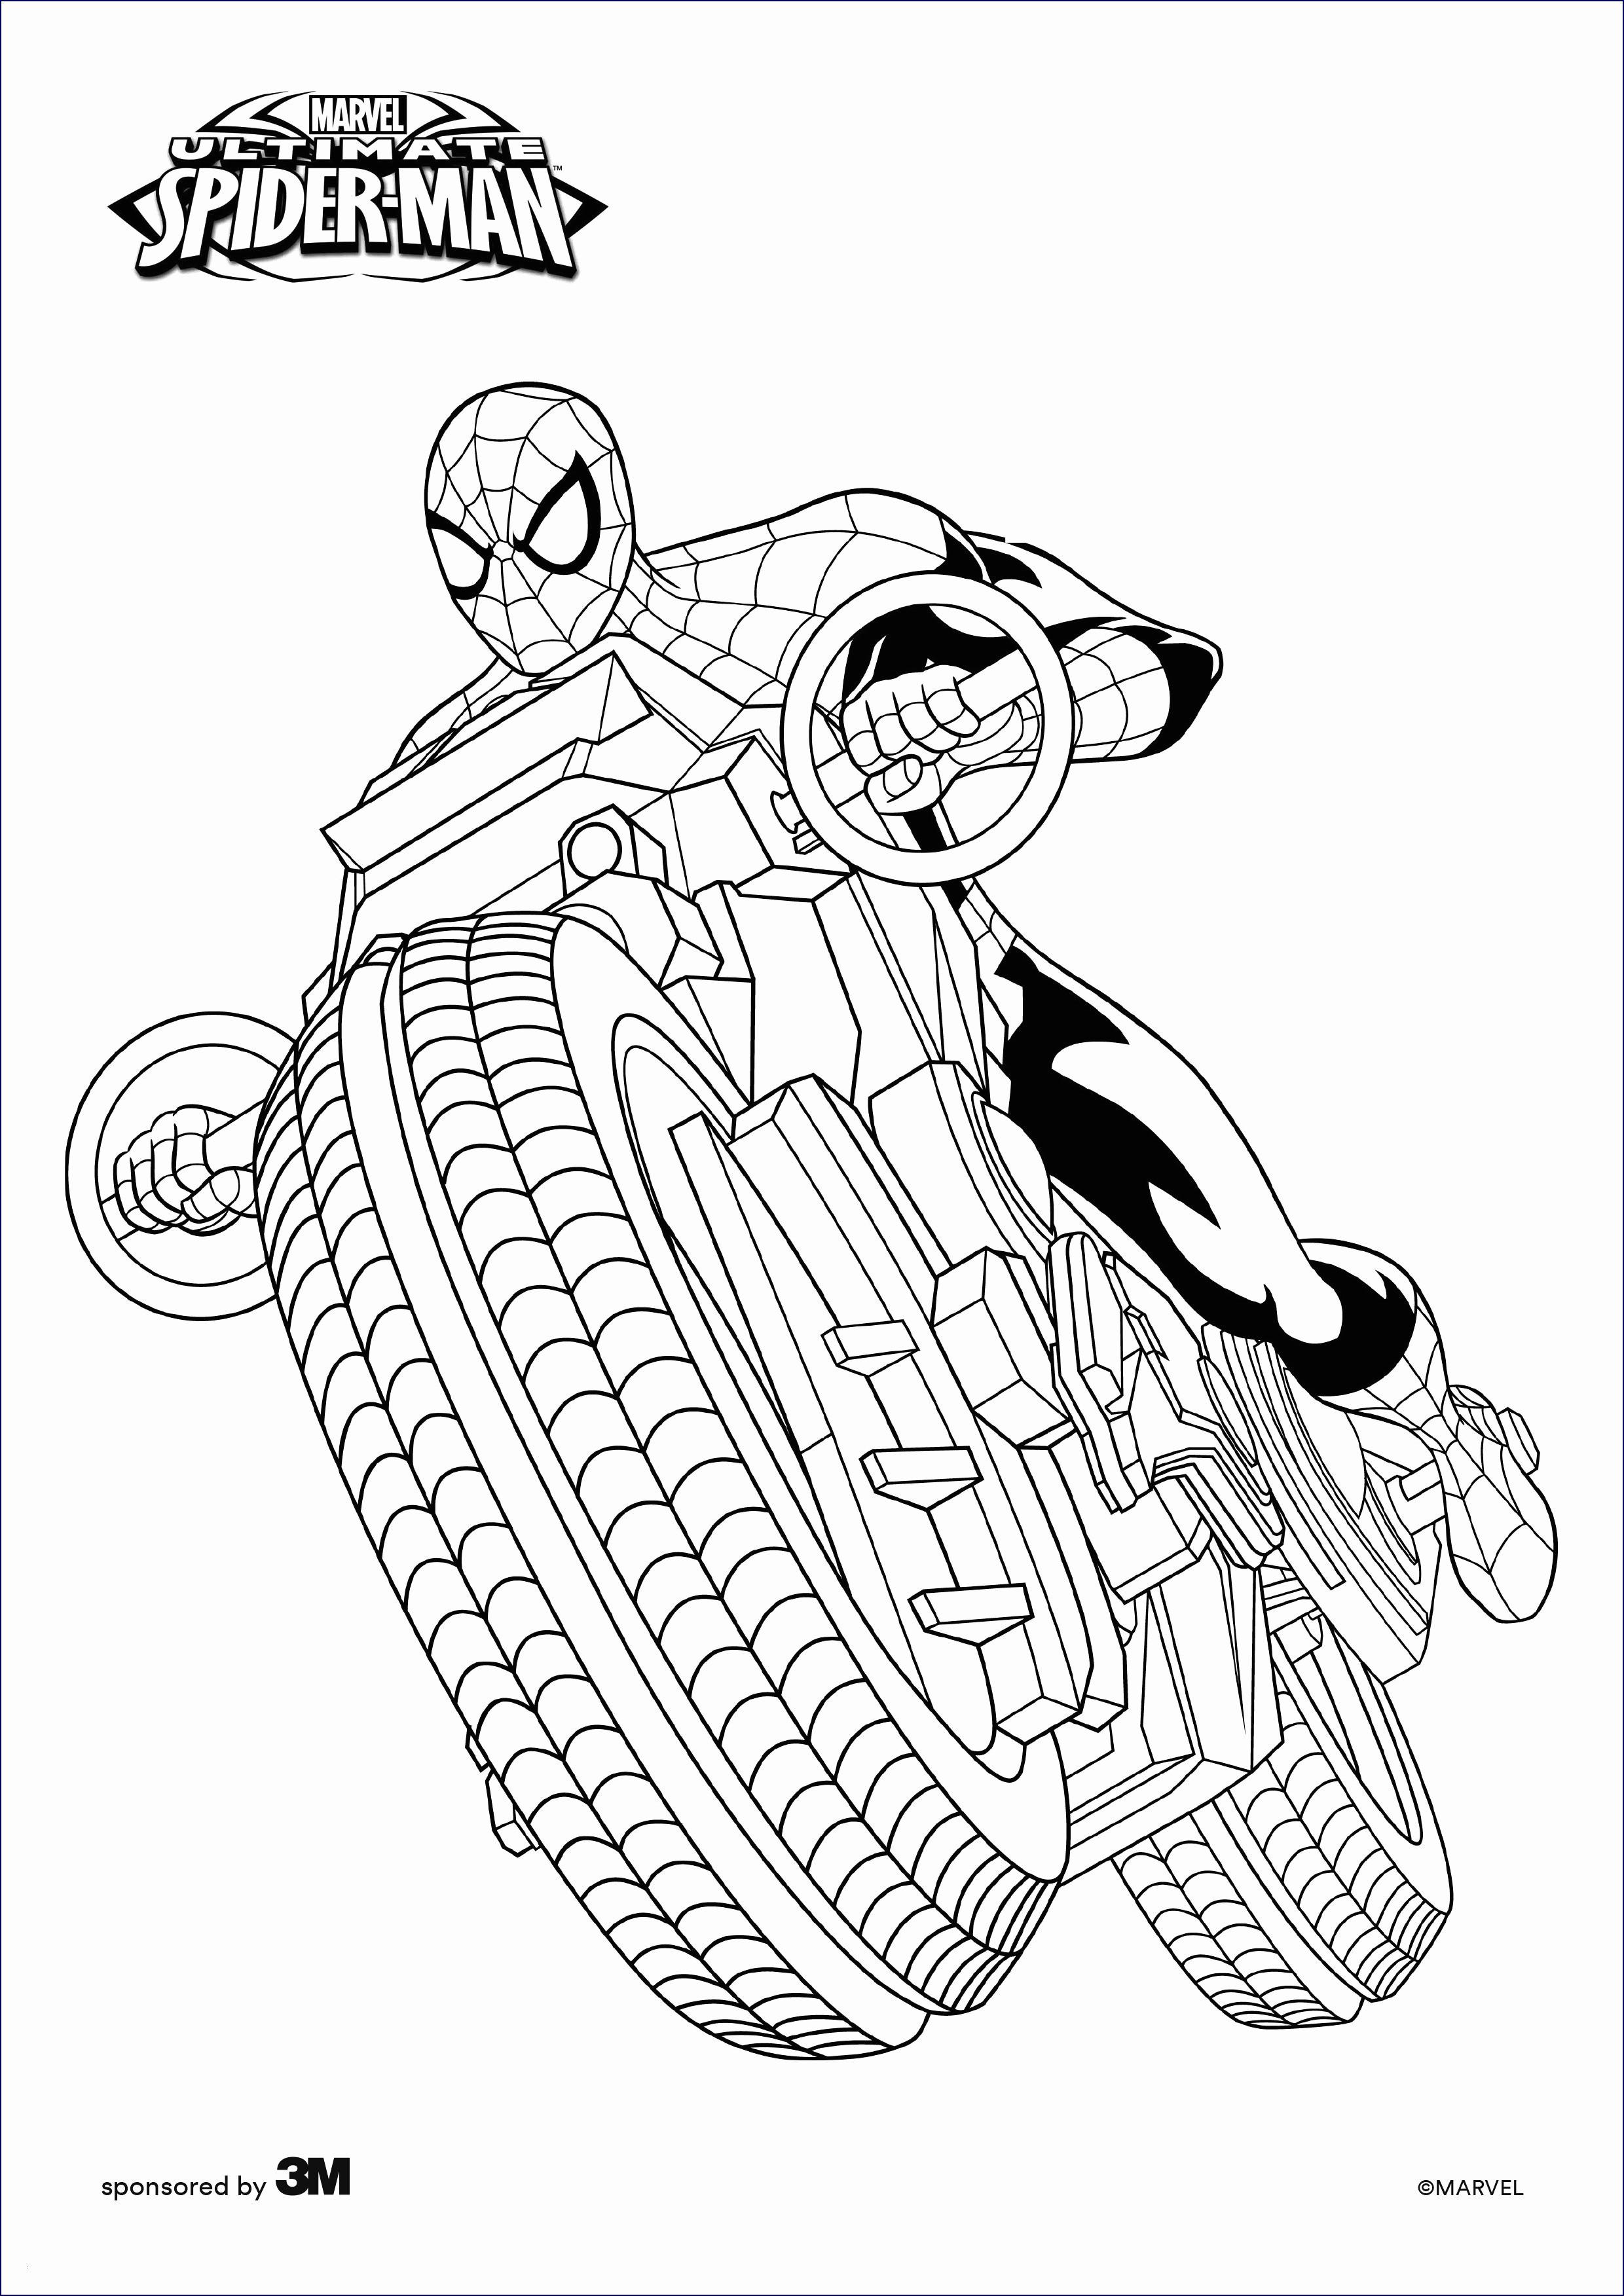 Anime Girl Ausmalbilder Inspirierend Ausmalbilder Iron Man Inspirierend Spiderman Ausmalbilder Zum Neu Stock